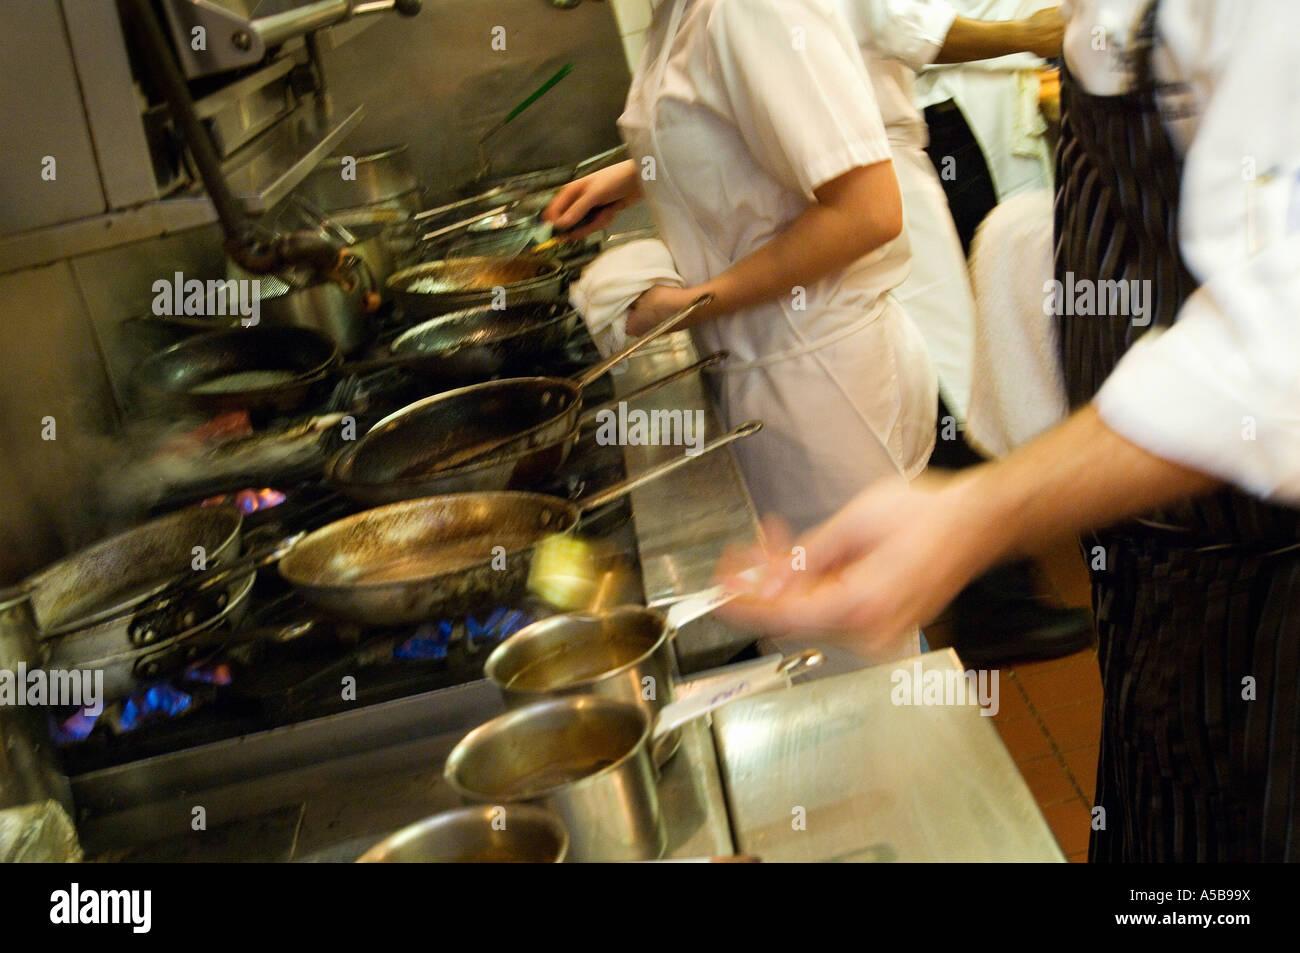 Busy Restaurant Kitchen busy restaurant kitchen stock photos & busy restaurant kitchen